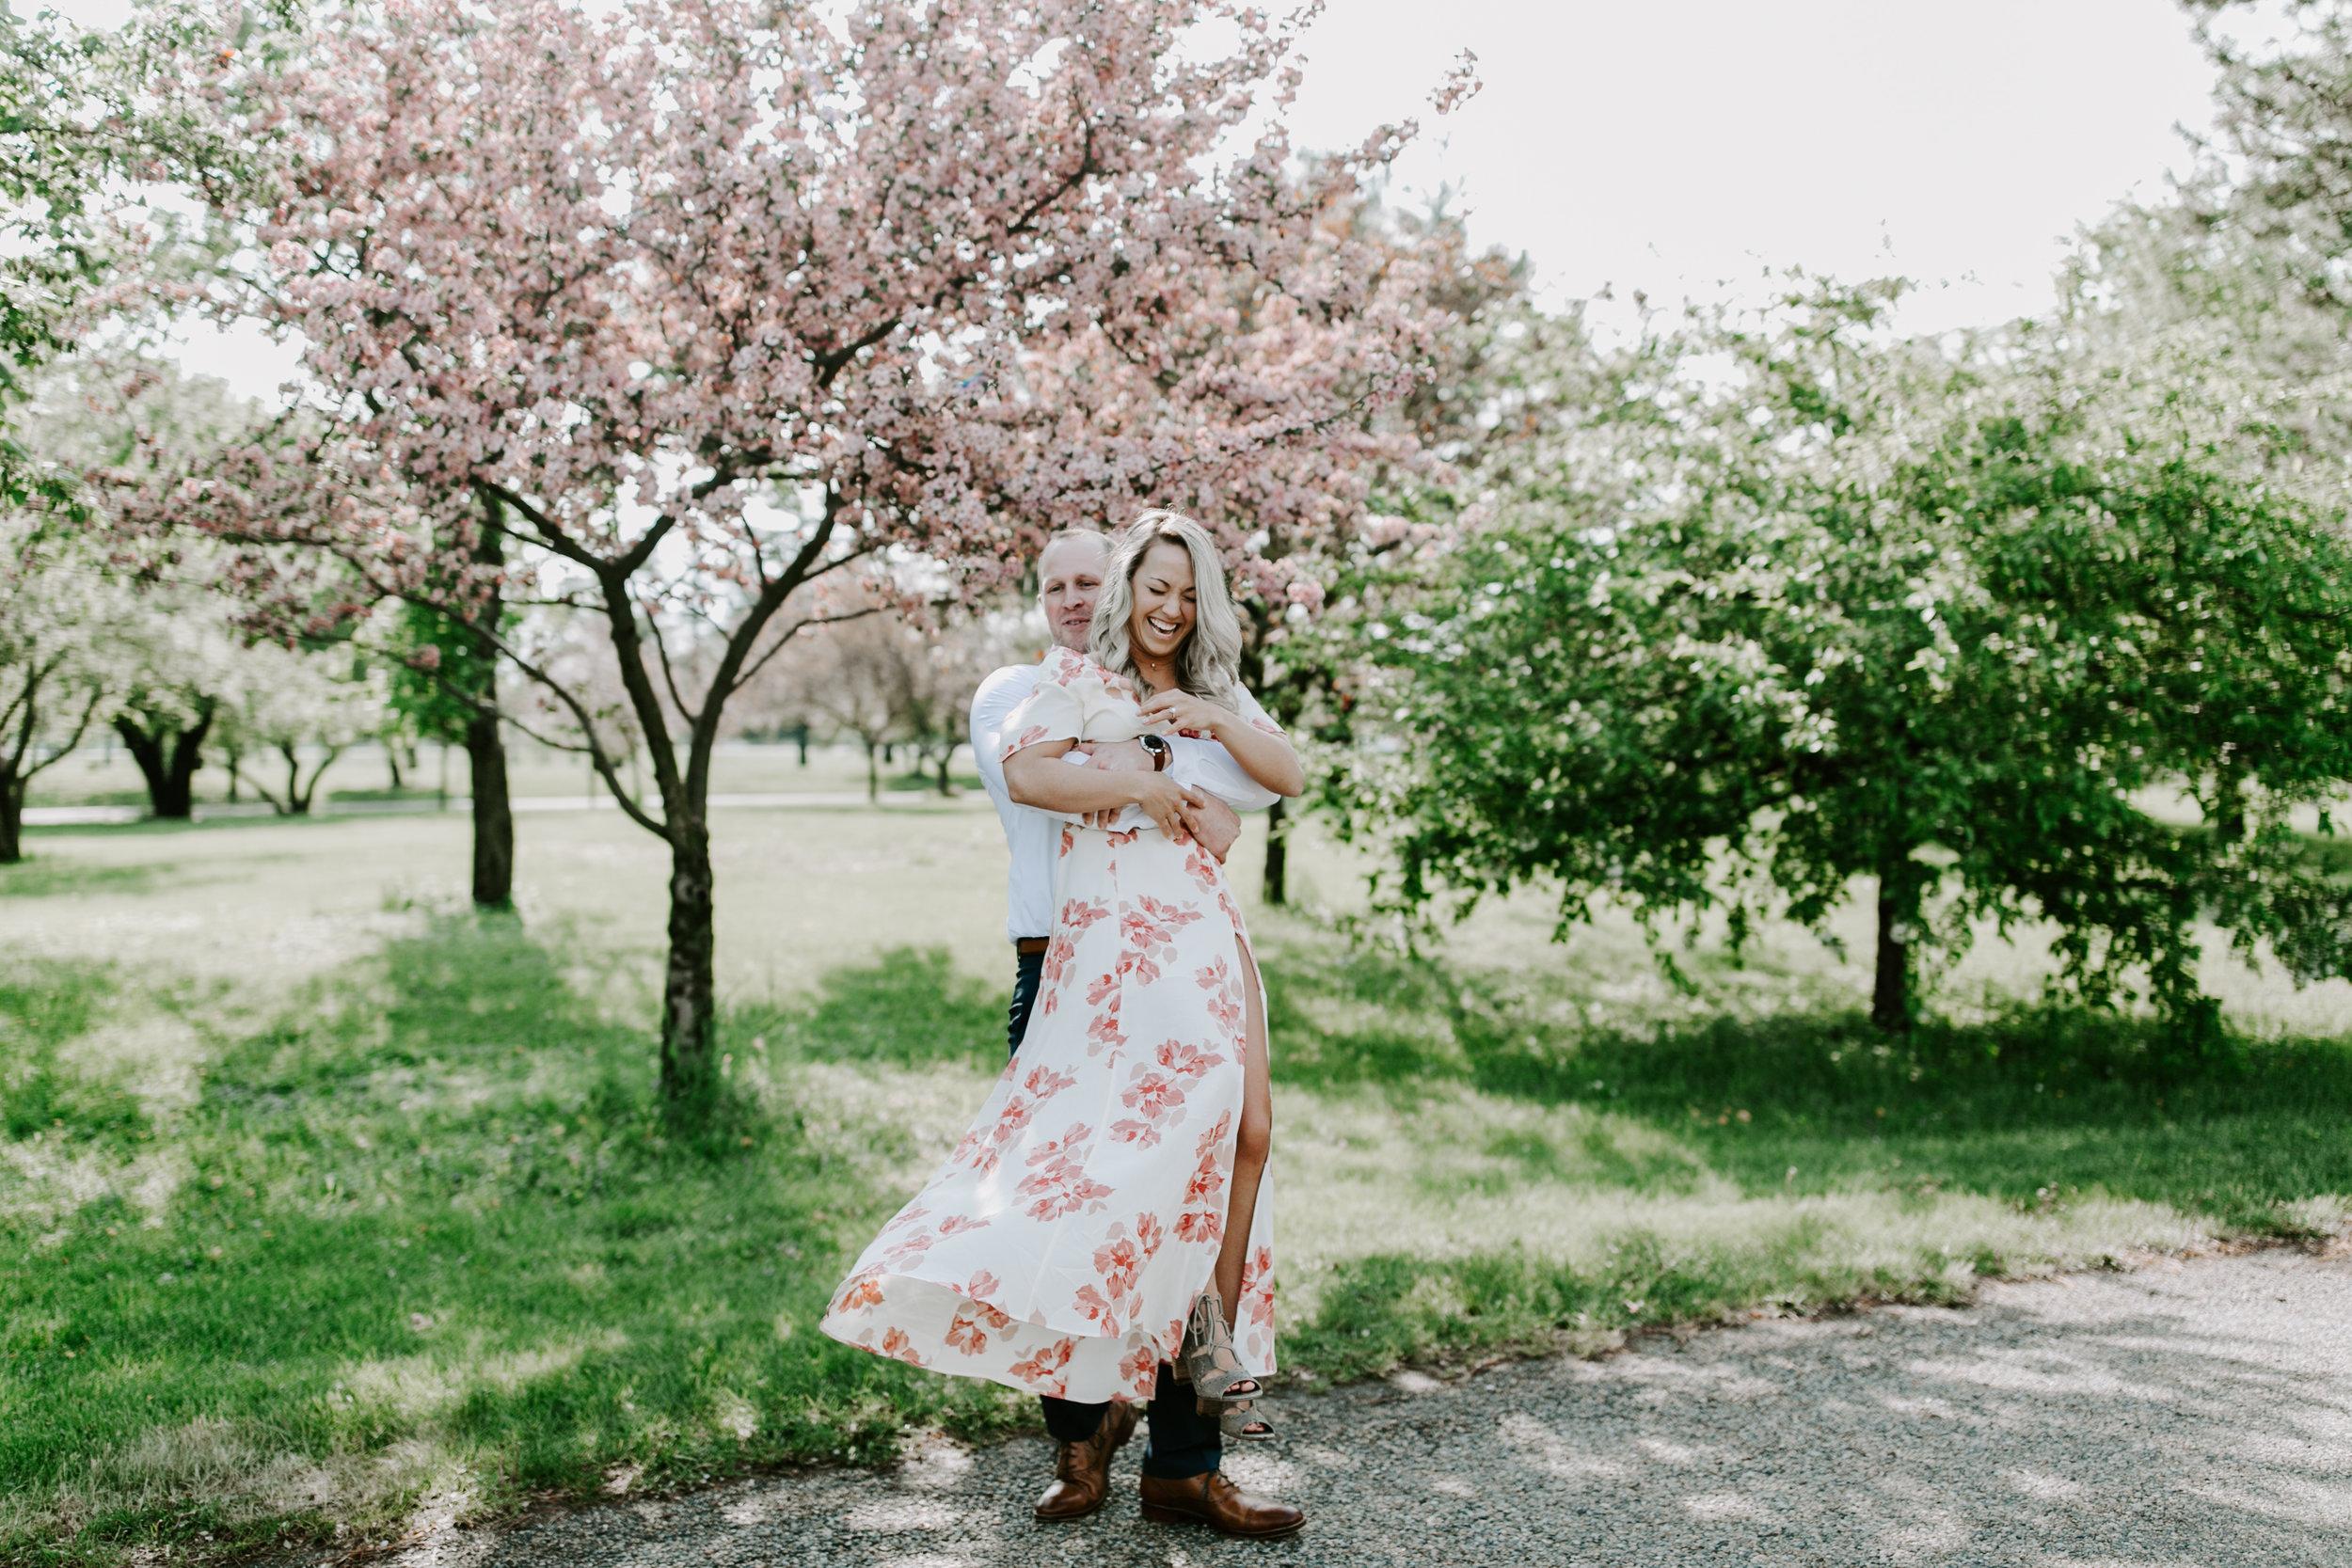 gracetphotography-wedding-photographer-adventure-bride-engagement-midwest-14.jpg